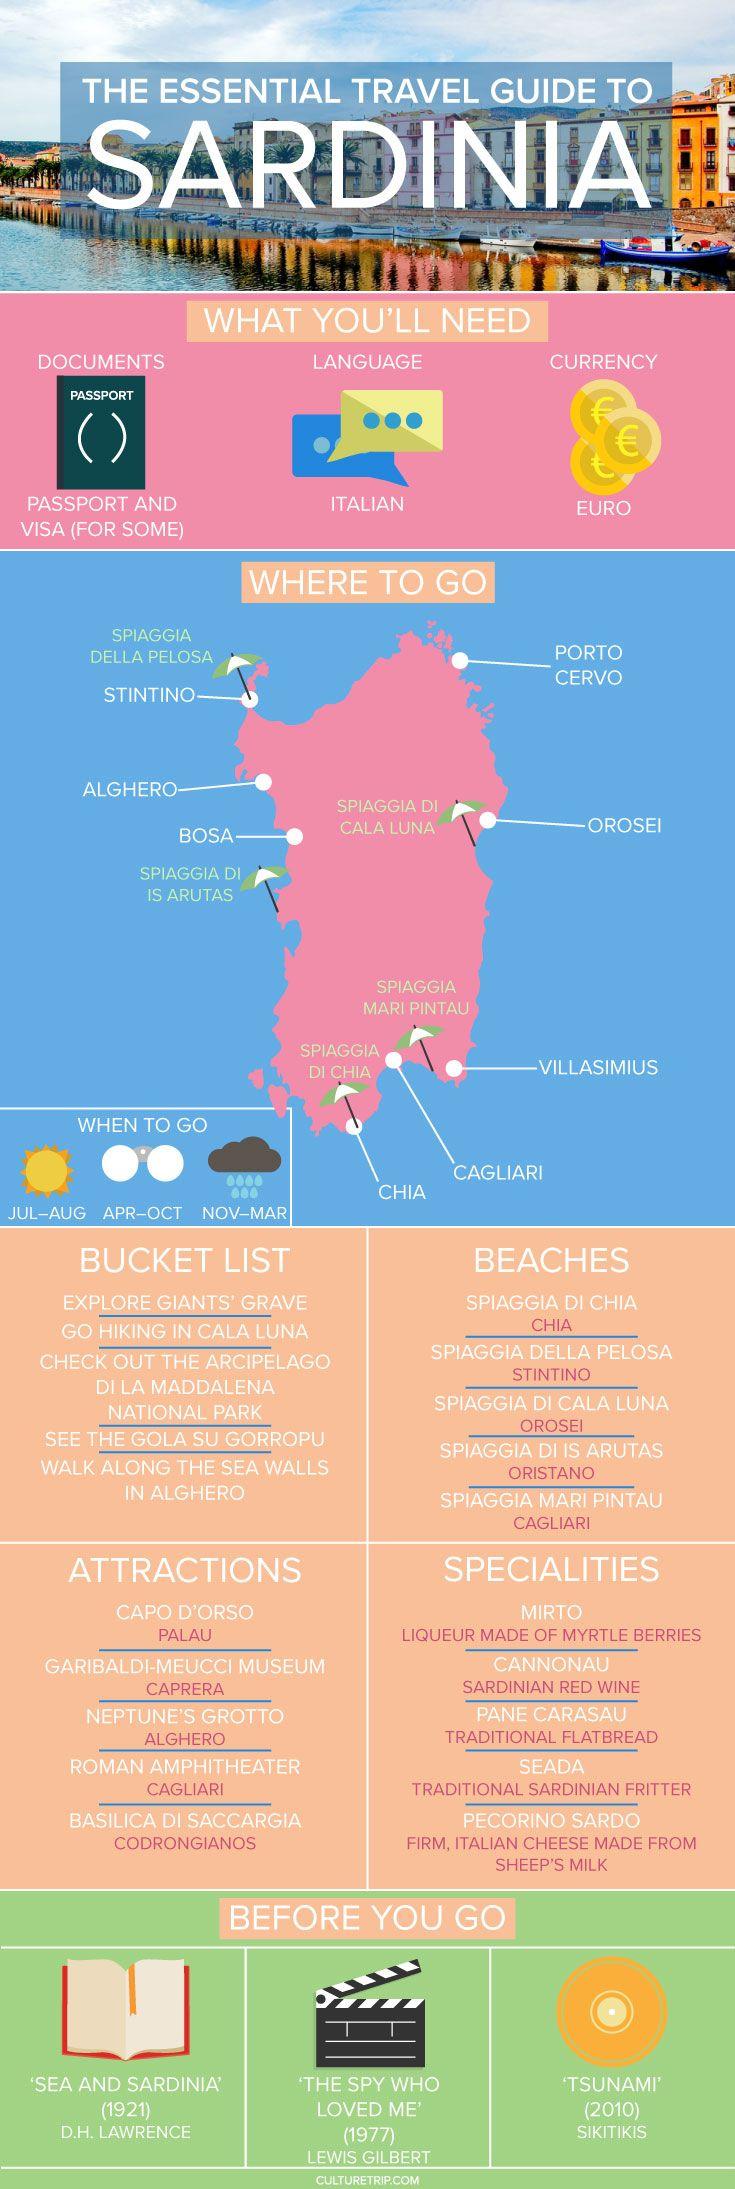 The Essential Travel Guide to Sardinia (Infographic) Pinterest: @theculturetrip